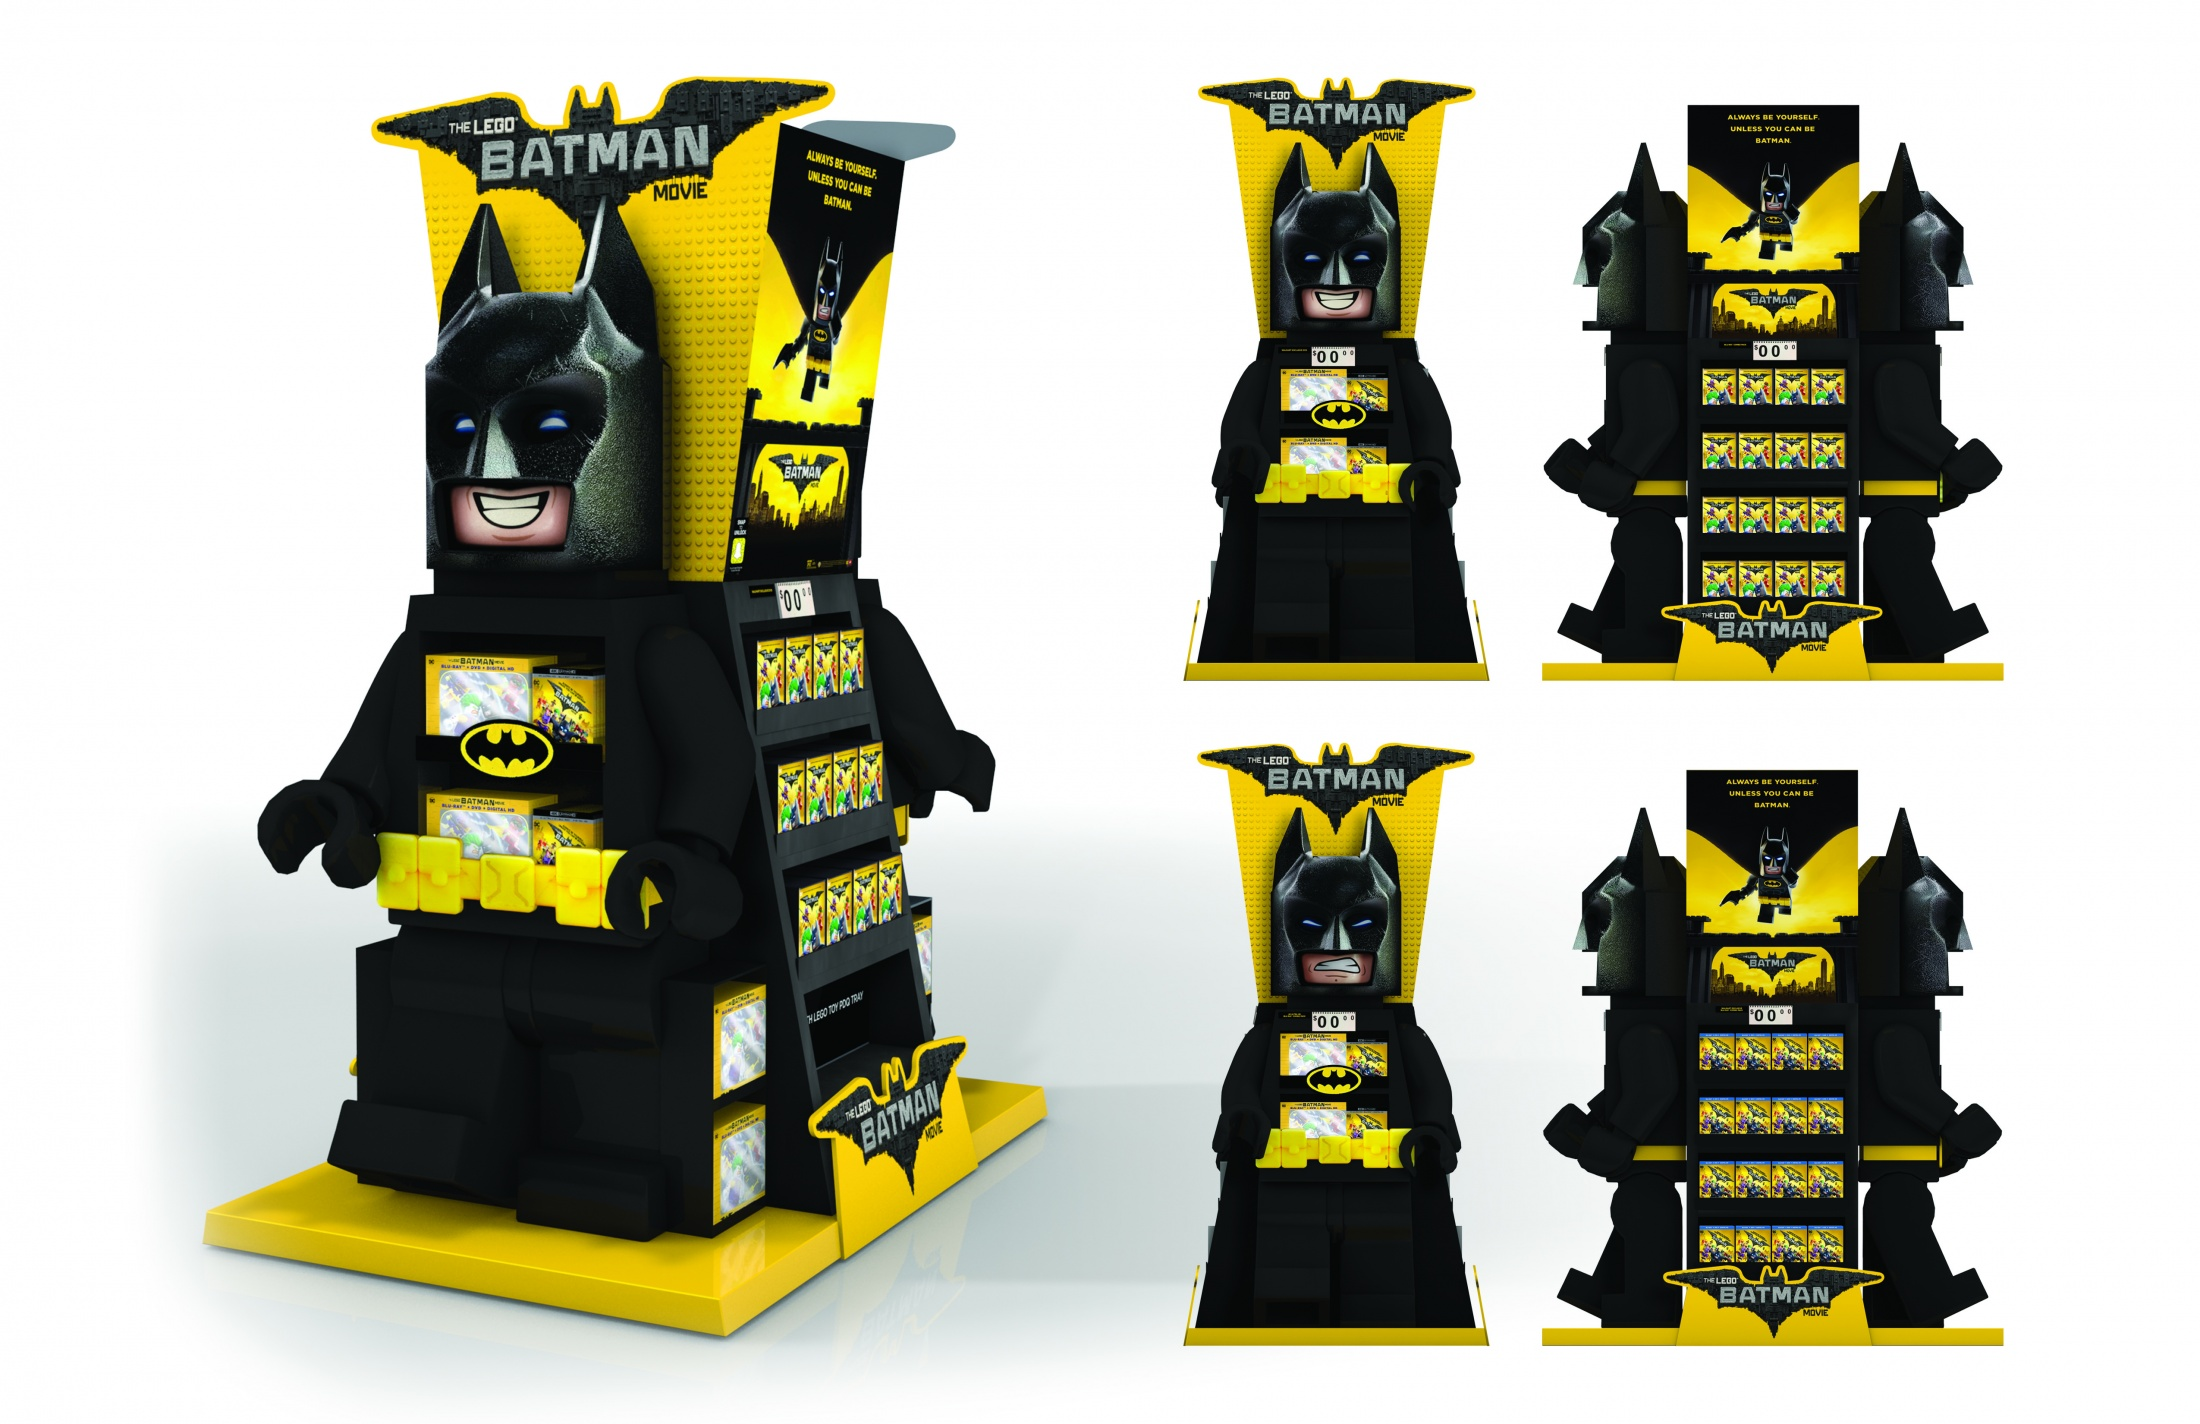 Thumbnail for Walmart Lego Batman WOW Display